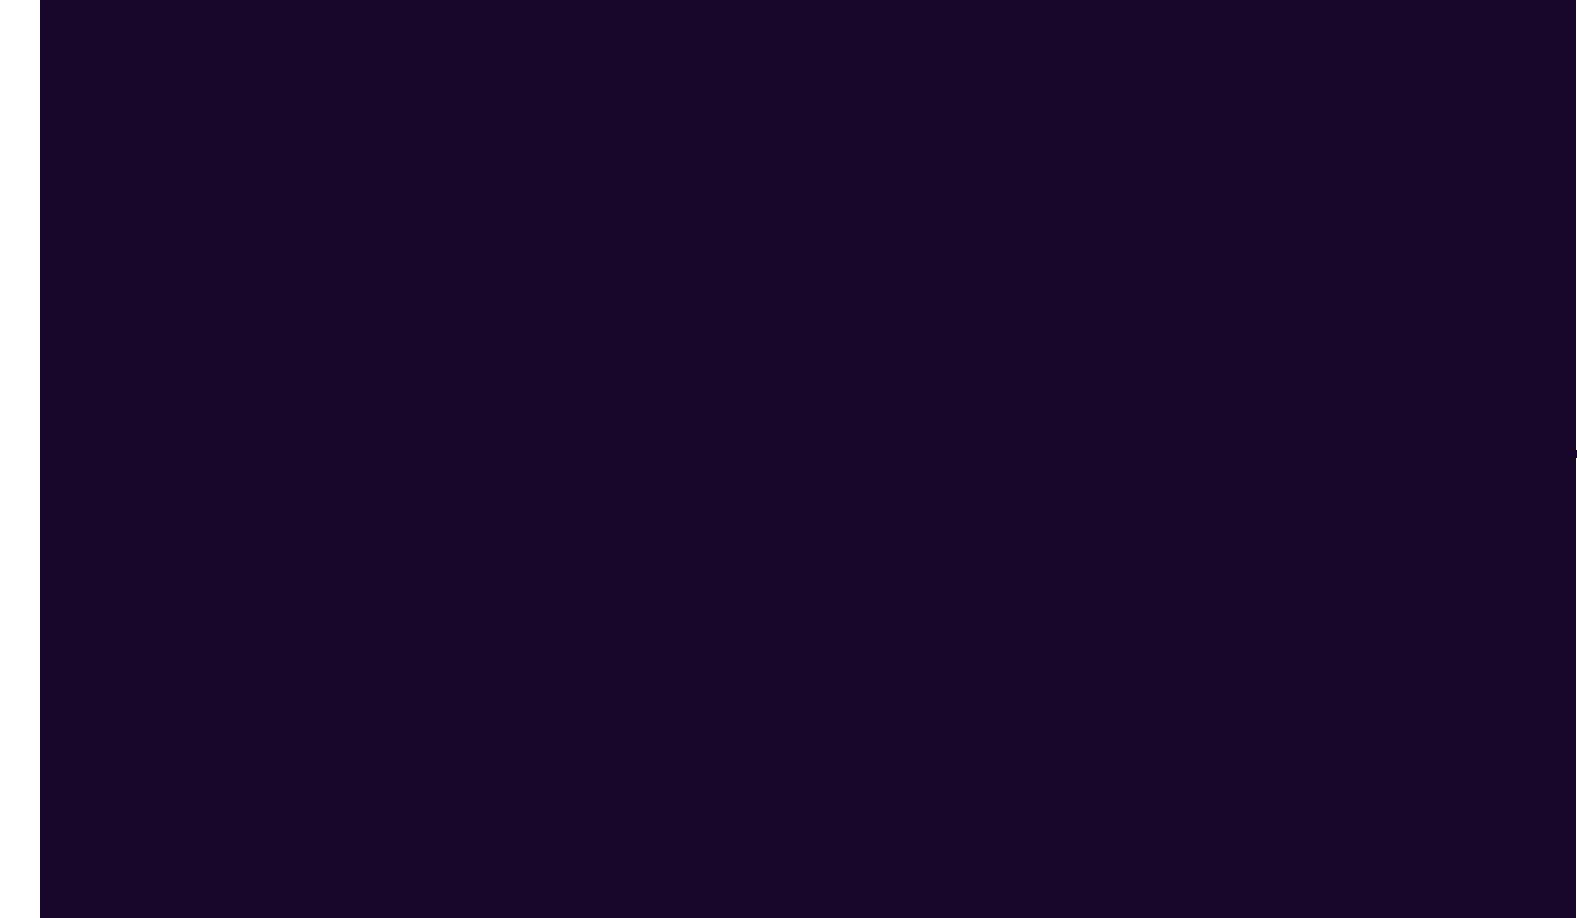 Carnegie Carnival - North Alabama's Premier Mardi Gras Celebration benefiting the Carnegie Visual Arts Center